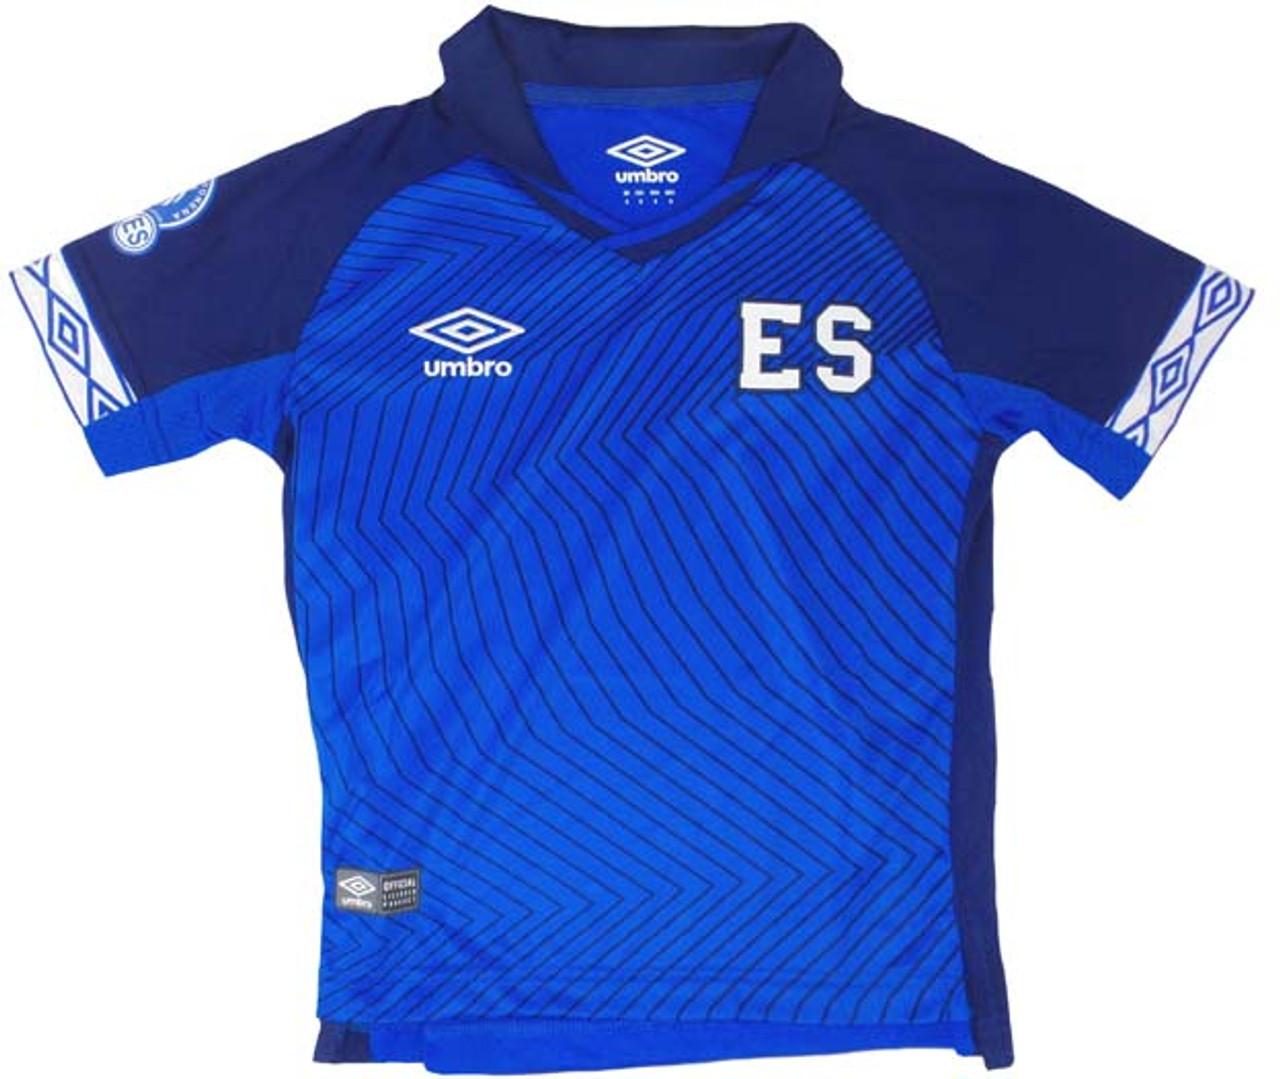 dcb25b13ee4 UMBRO EL SALVADOR 2019 GOLD CUP BOYS JERSEY BLUE - Soccer Plus